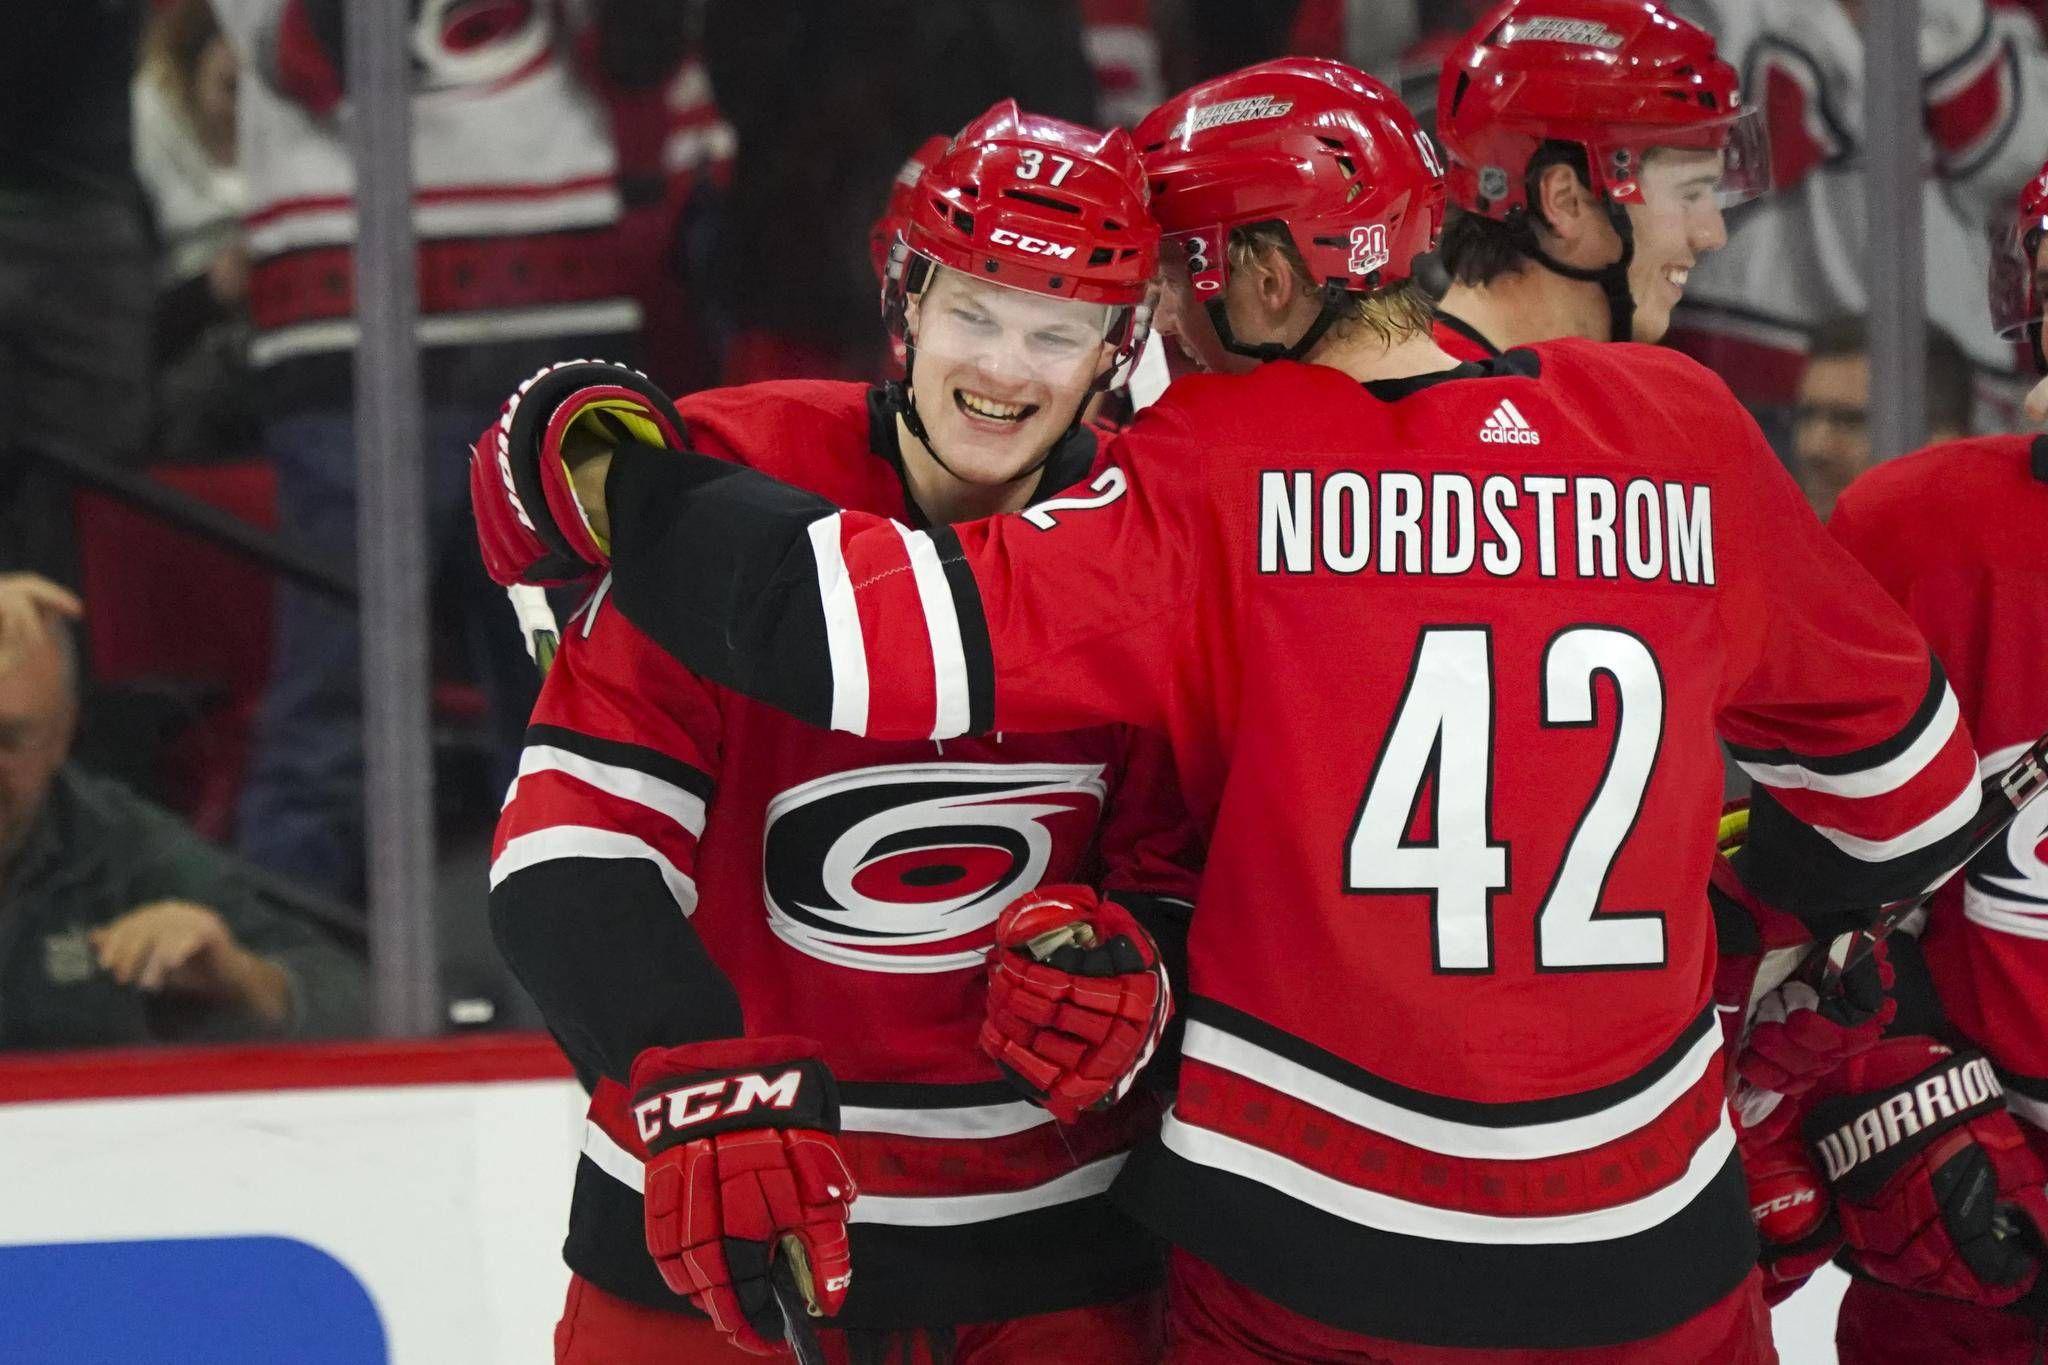 Warren Foegele scores in NHL debut as Hurricanes beat Senators - The ... 4b09b9e32